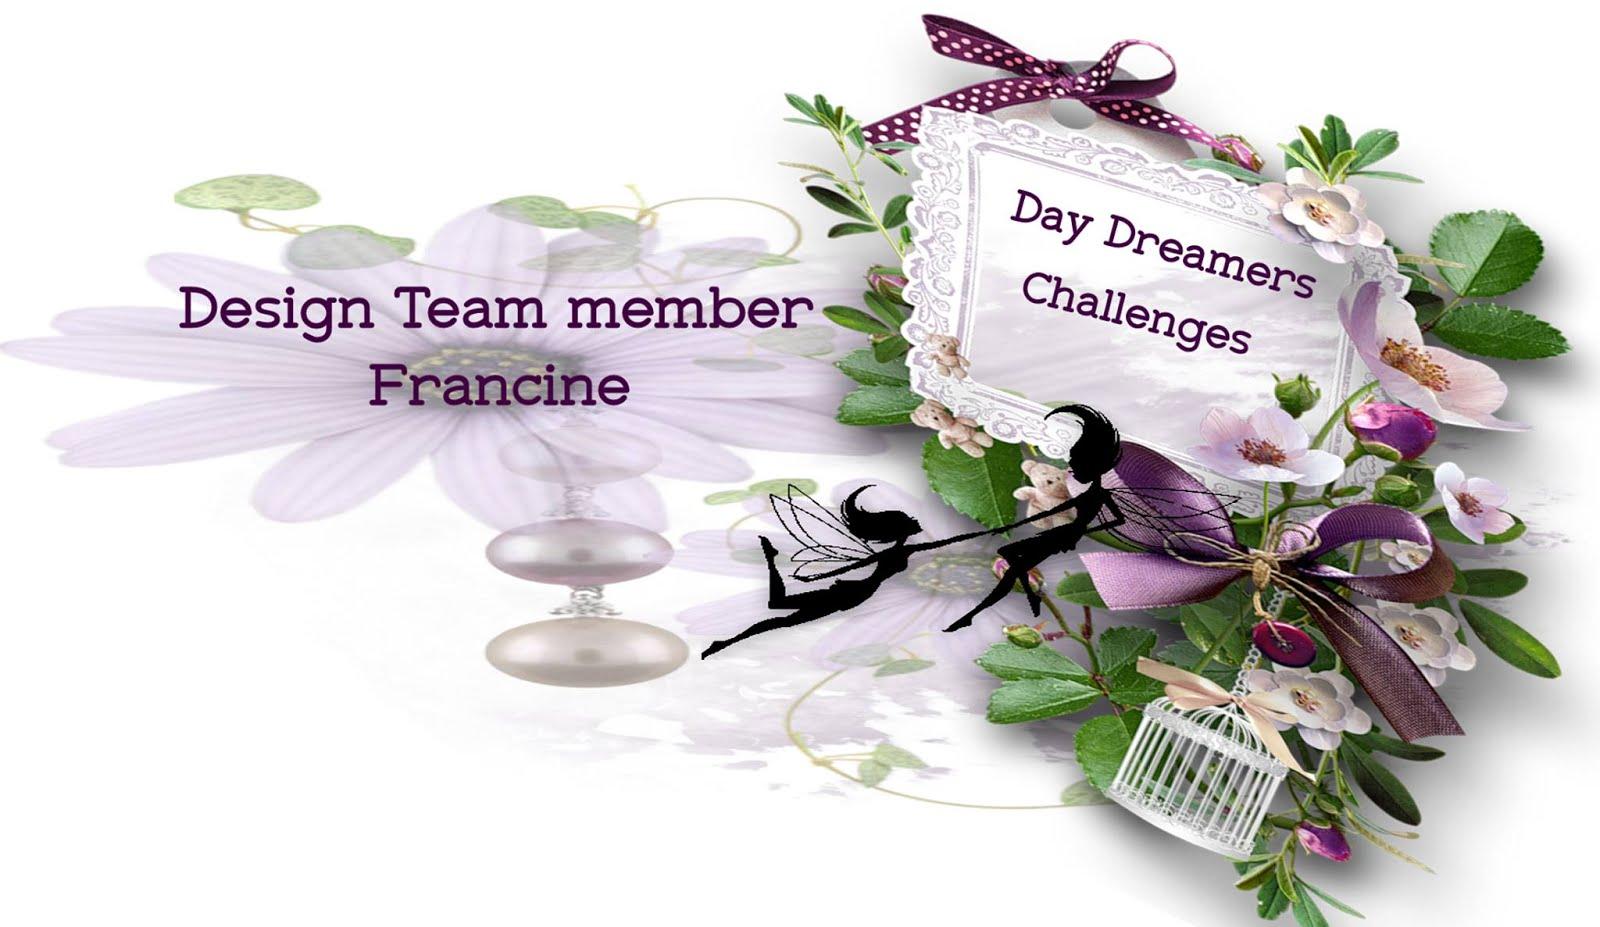 Day Dreamer Challenge